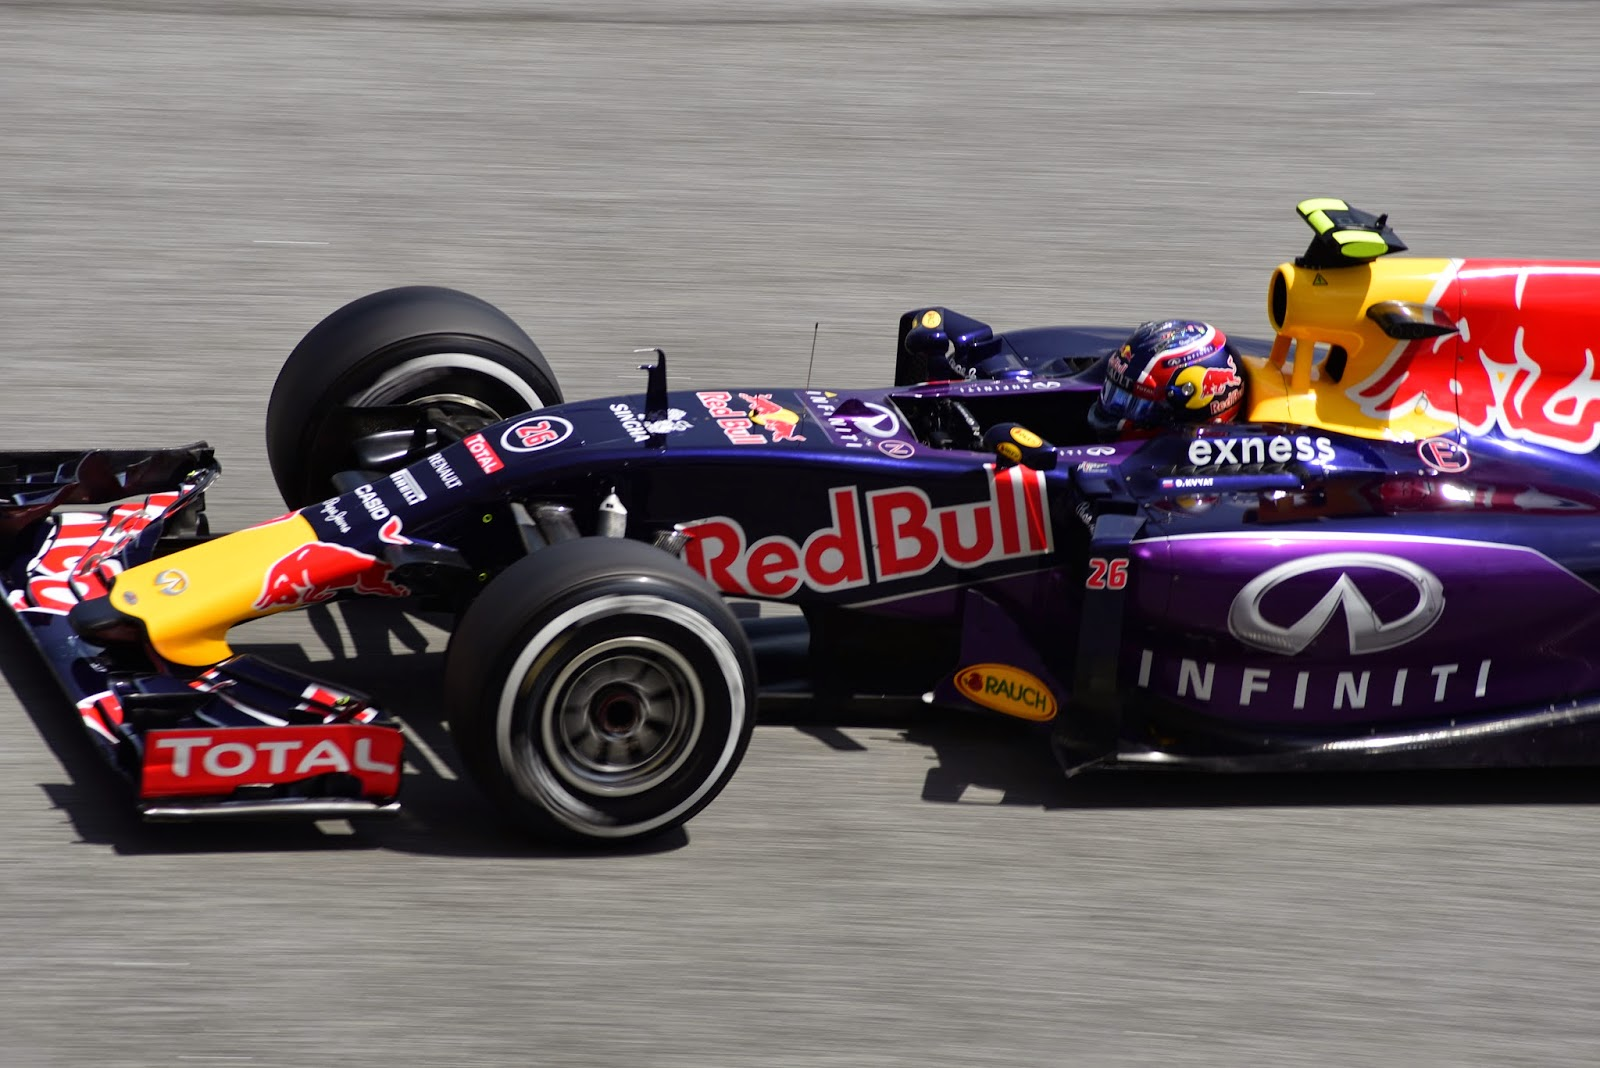 Daniil Kvyat driving inside a Formula 1 CCar